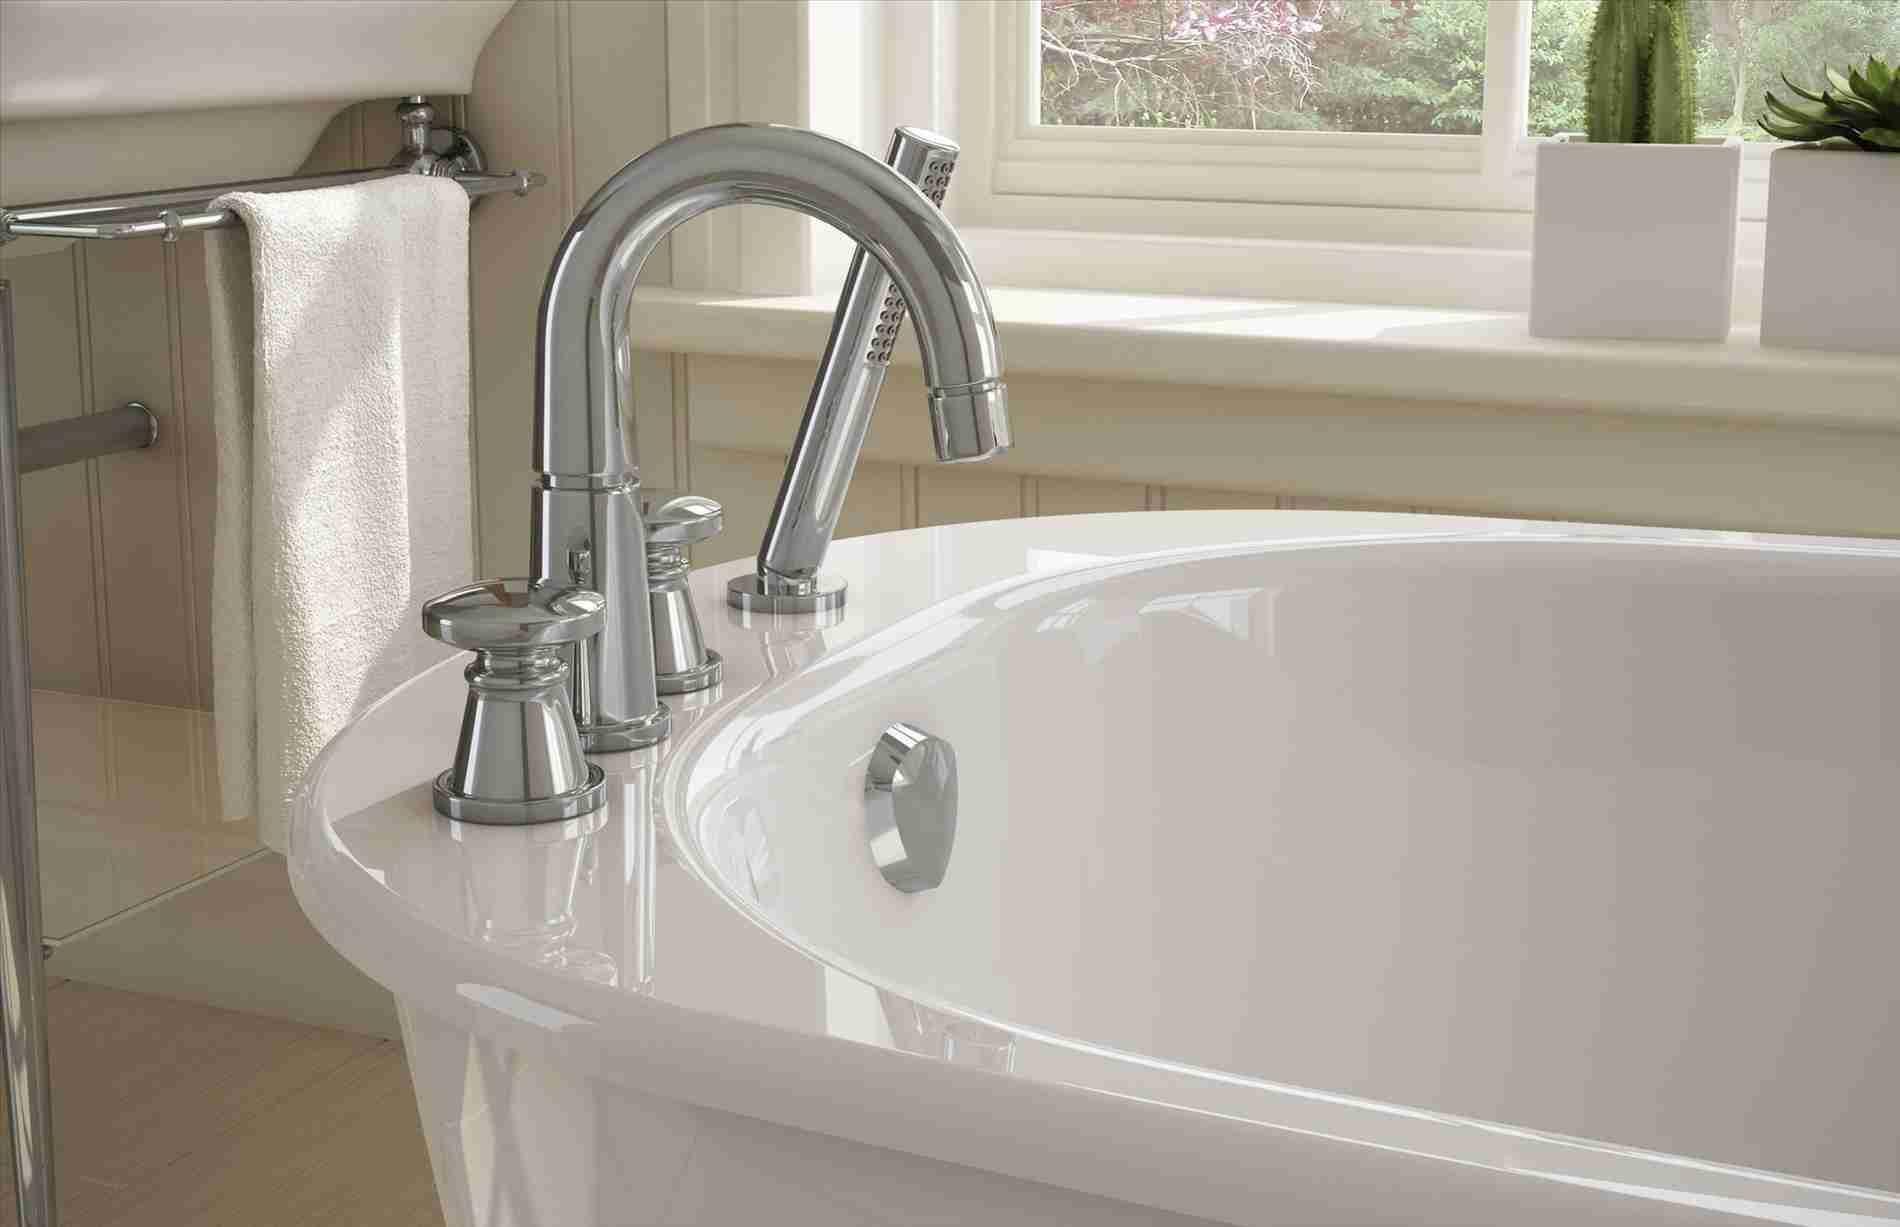 Colorful Maax Tub Reviews Ornament - Bathroom and Shower Ideas ...